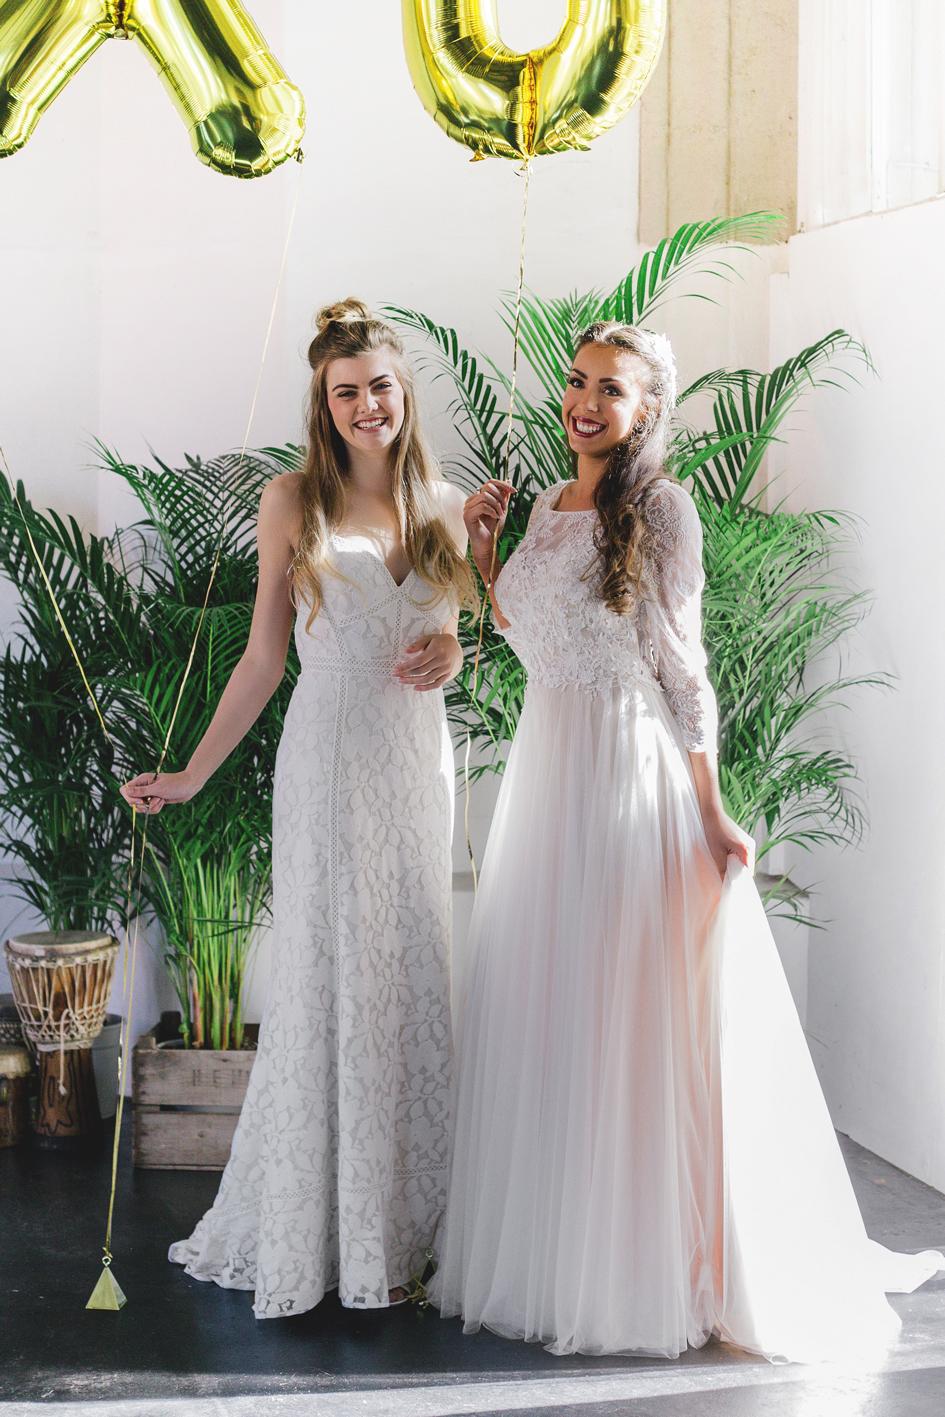 norfolk_wedding_photographer _norwich_anglia_documentary_reportage_storybook (30).jpg